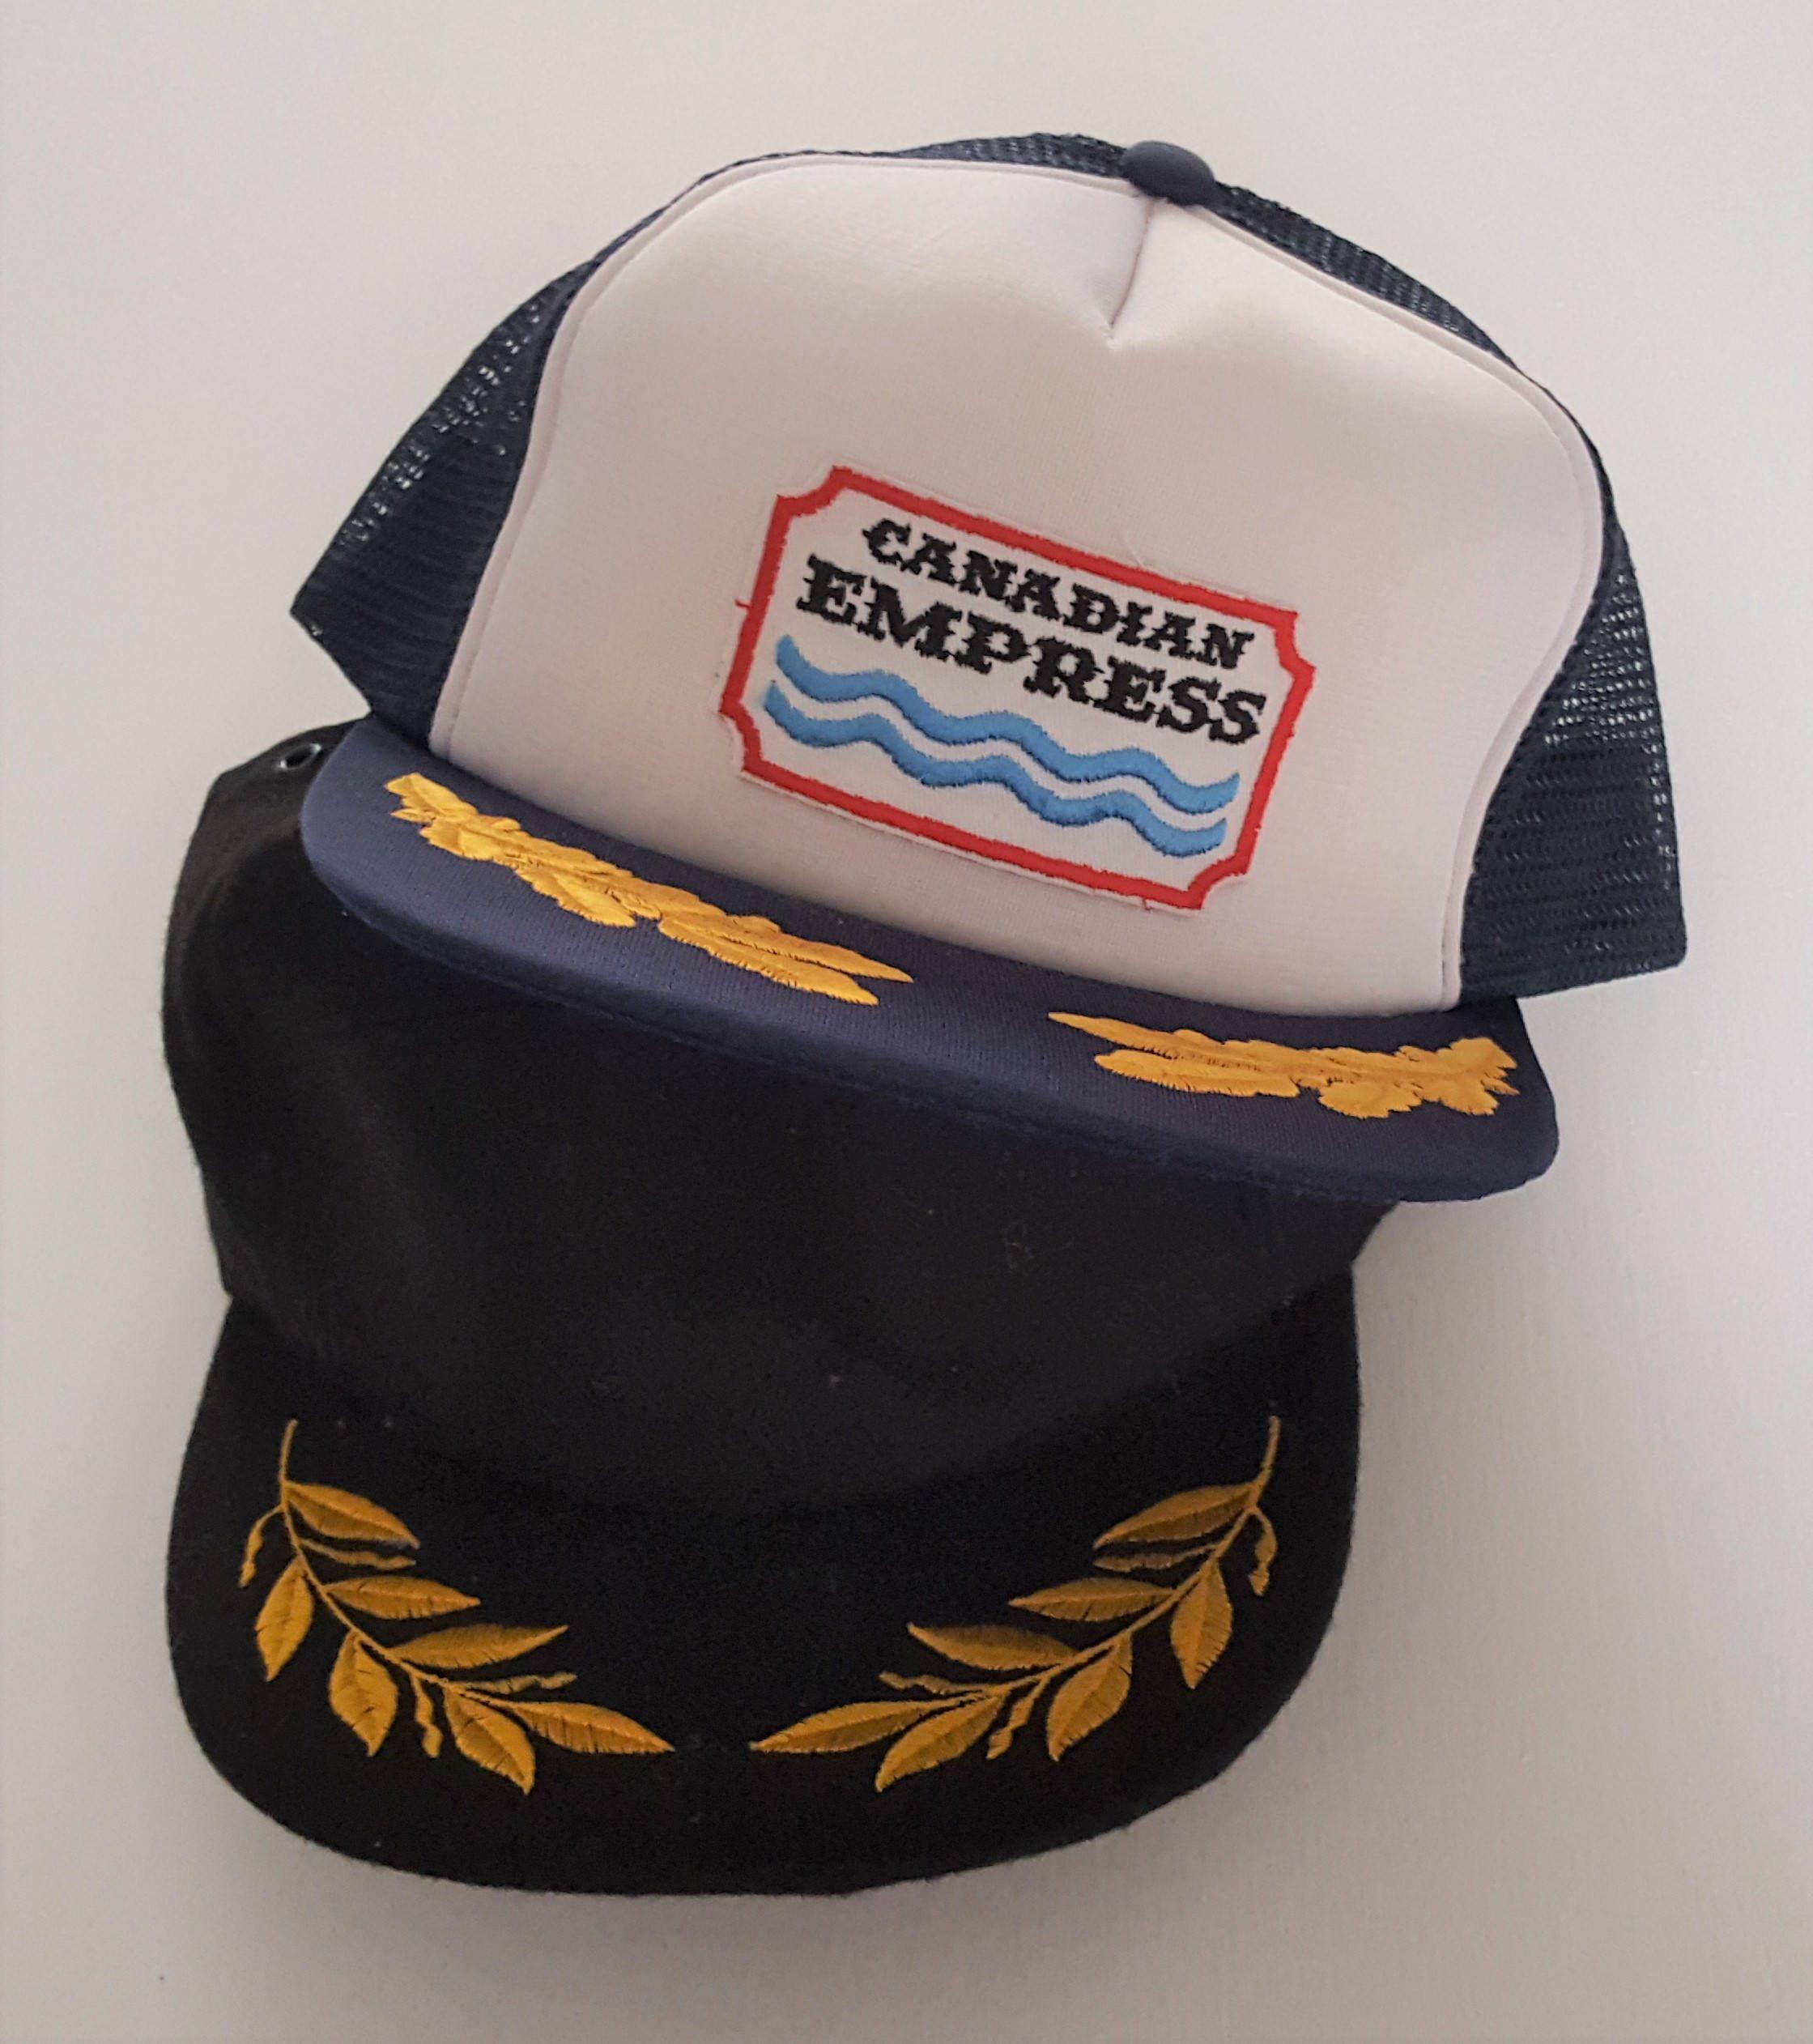 48bb5d21531 Vintage Lot (2) Trucker Style Snapback Hats VTG by StreetwearAndVintage on  Etsy